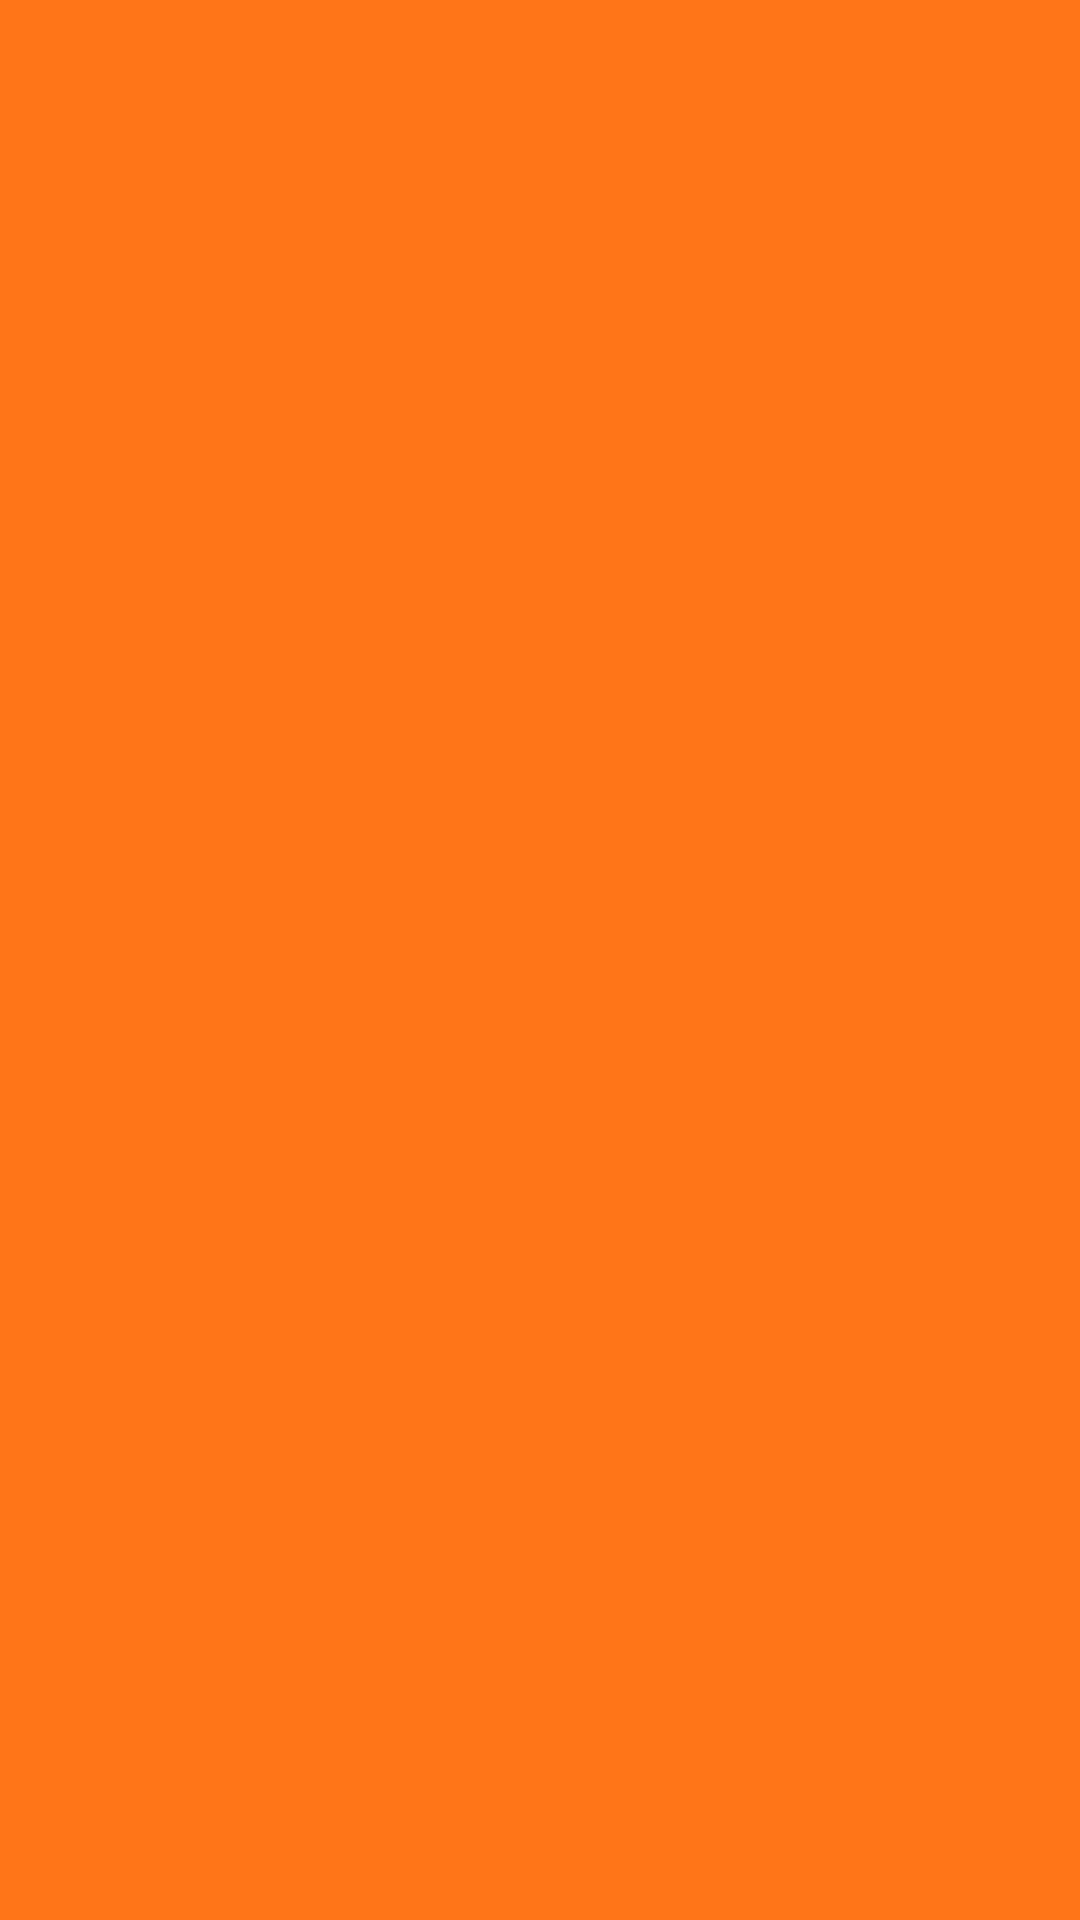 1080x1920 Pumpkin Solid Color Background